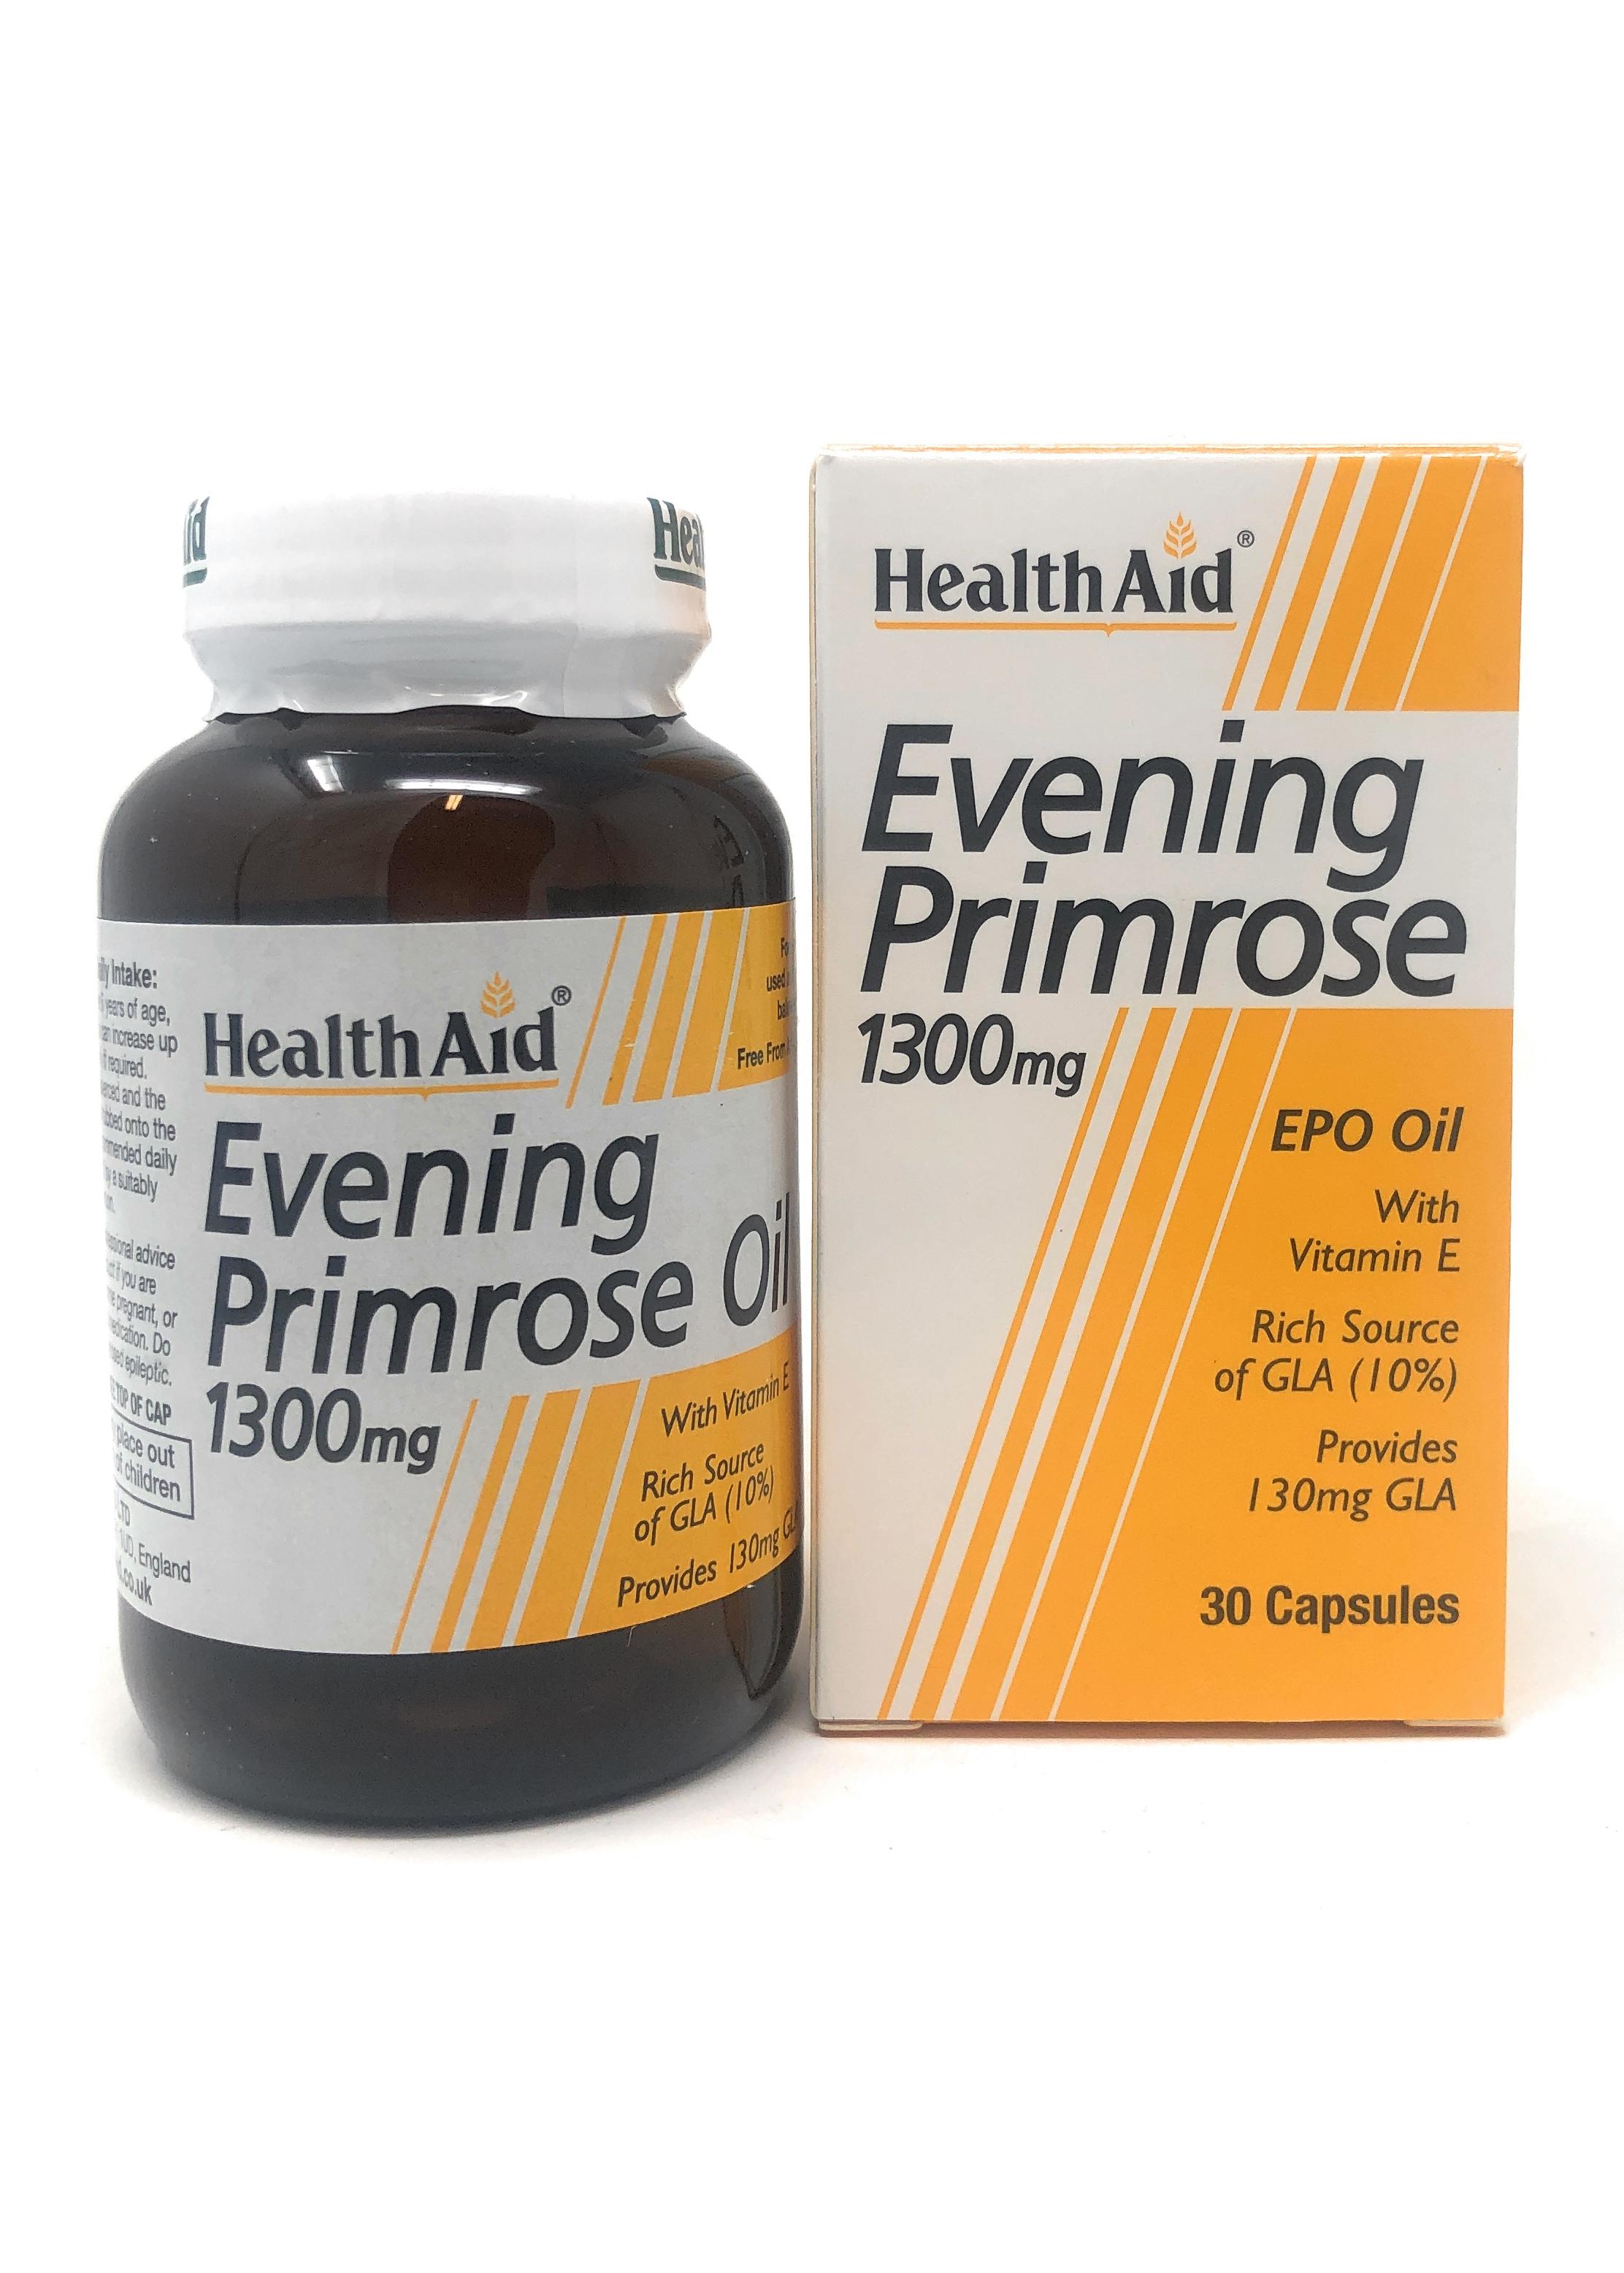 HealthAid Evening Primrose Oil 1300mg (Nachtkerzenöl) 30 Softgels